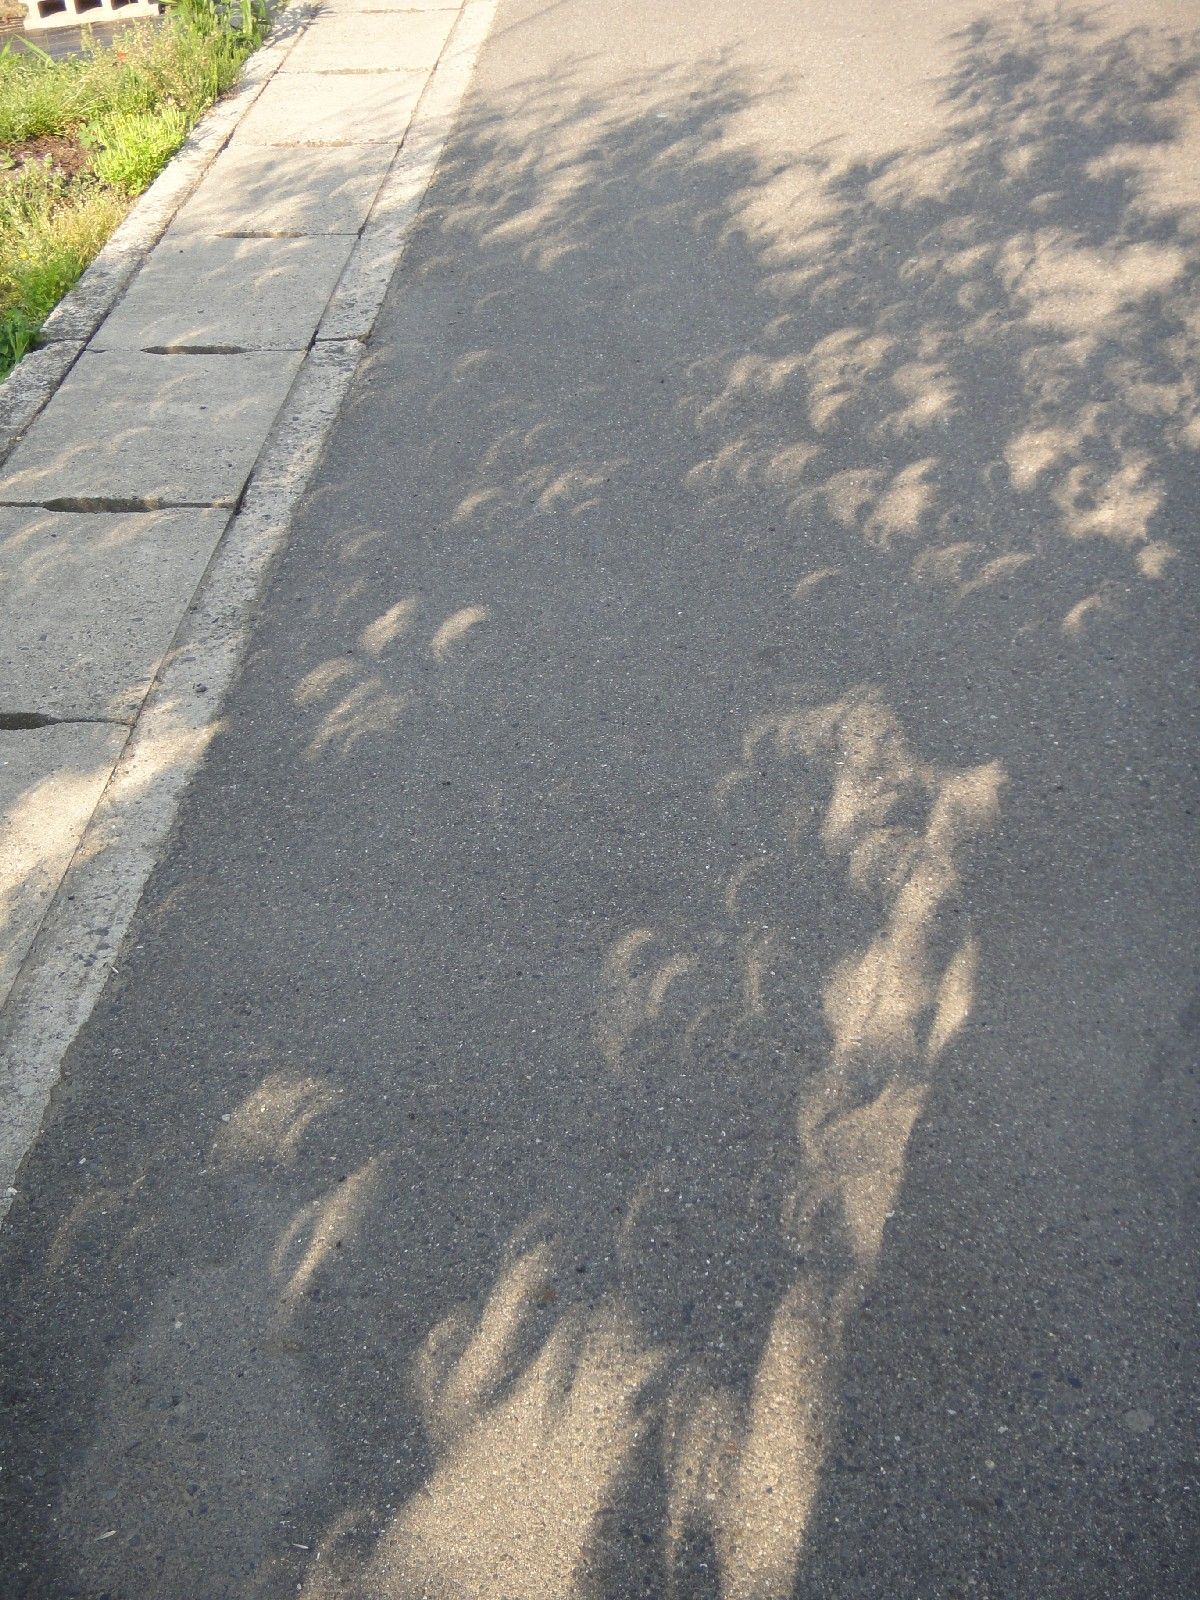 Solar_Eclipse_014.jpg